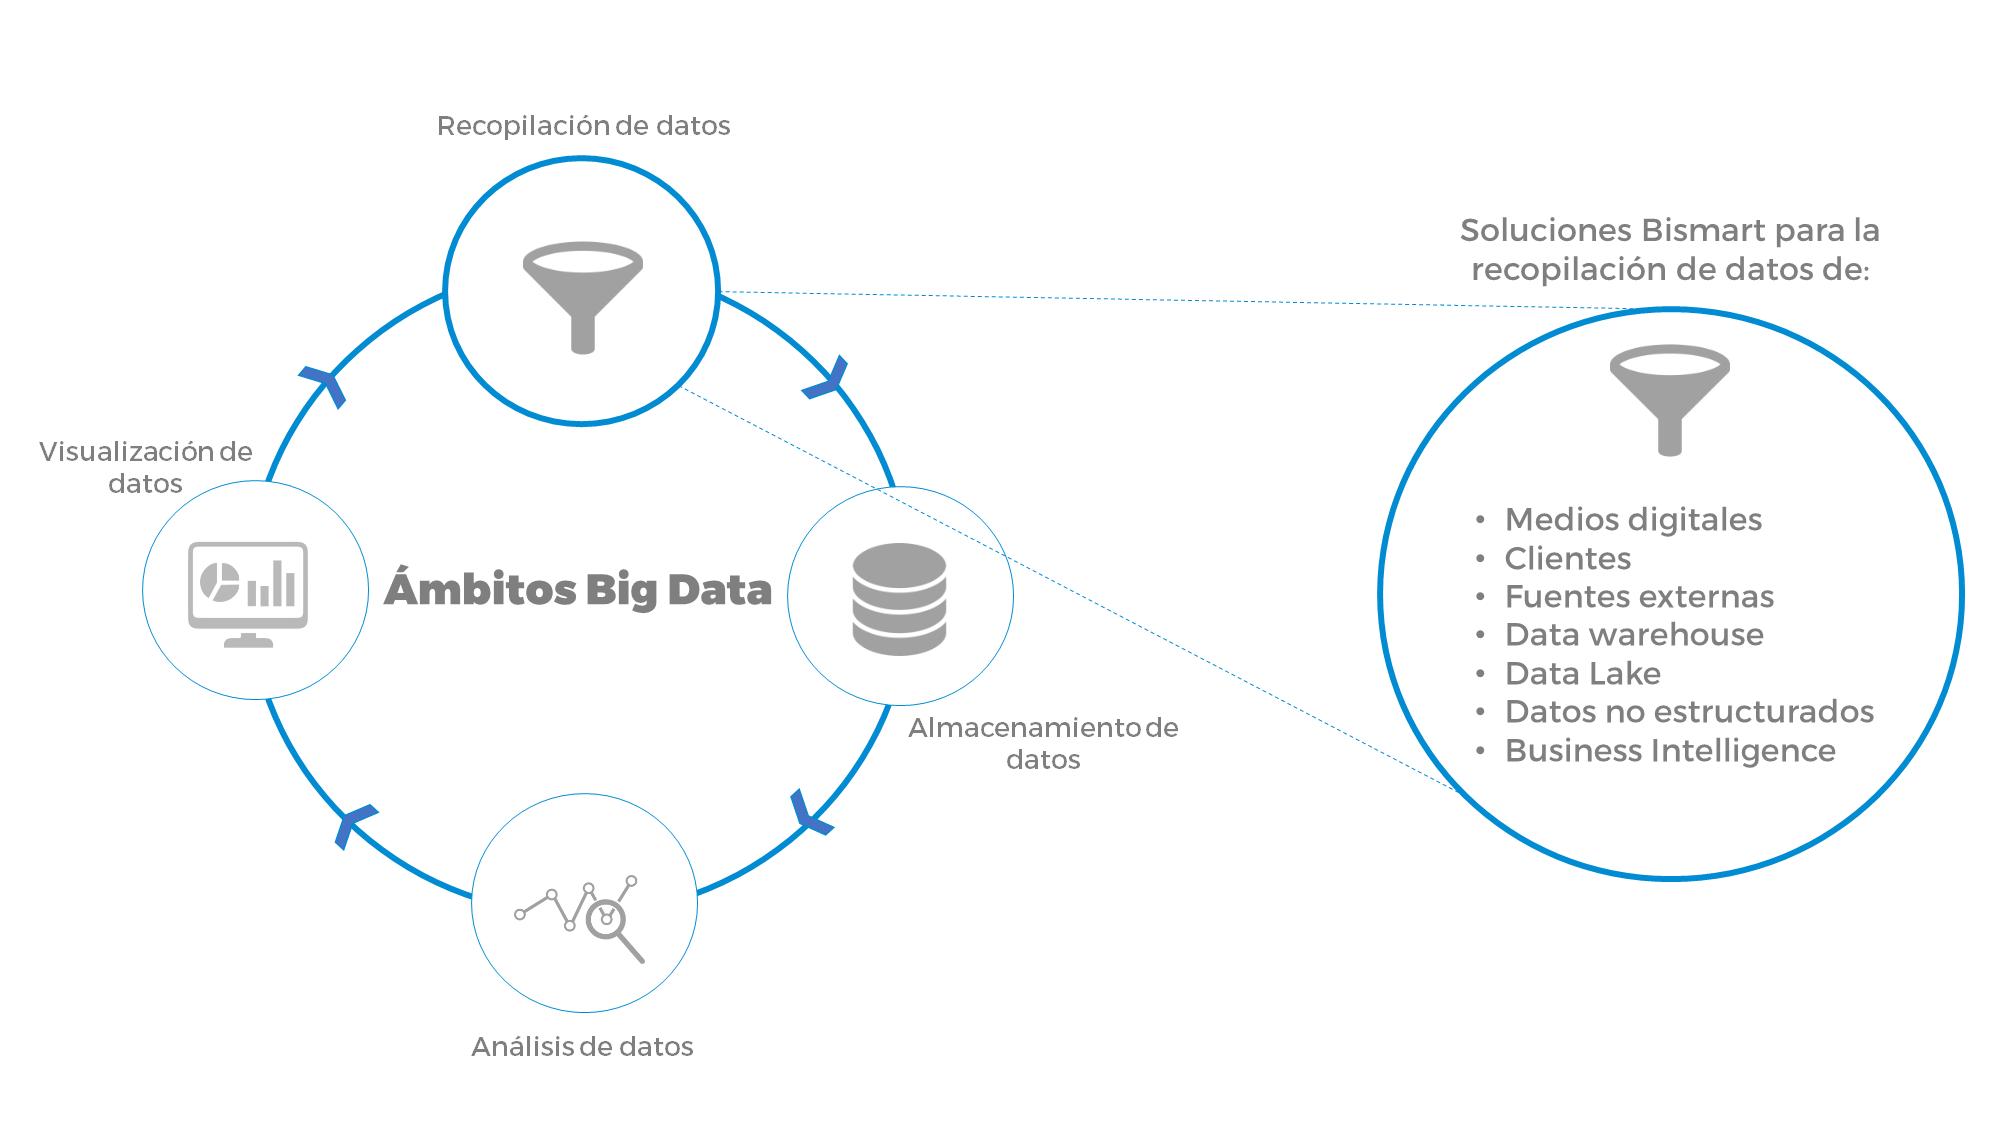 big data recopilacion de datos bismart